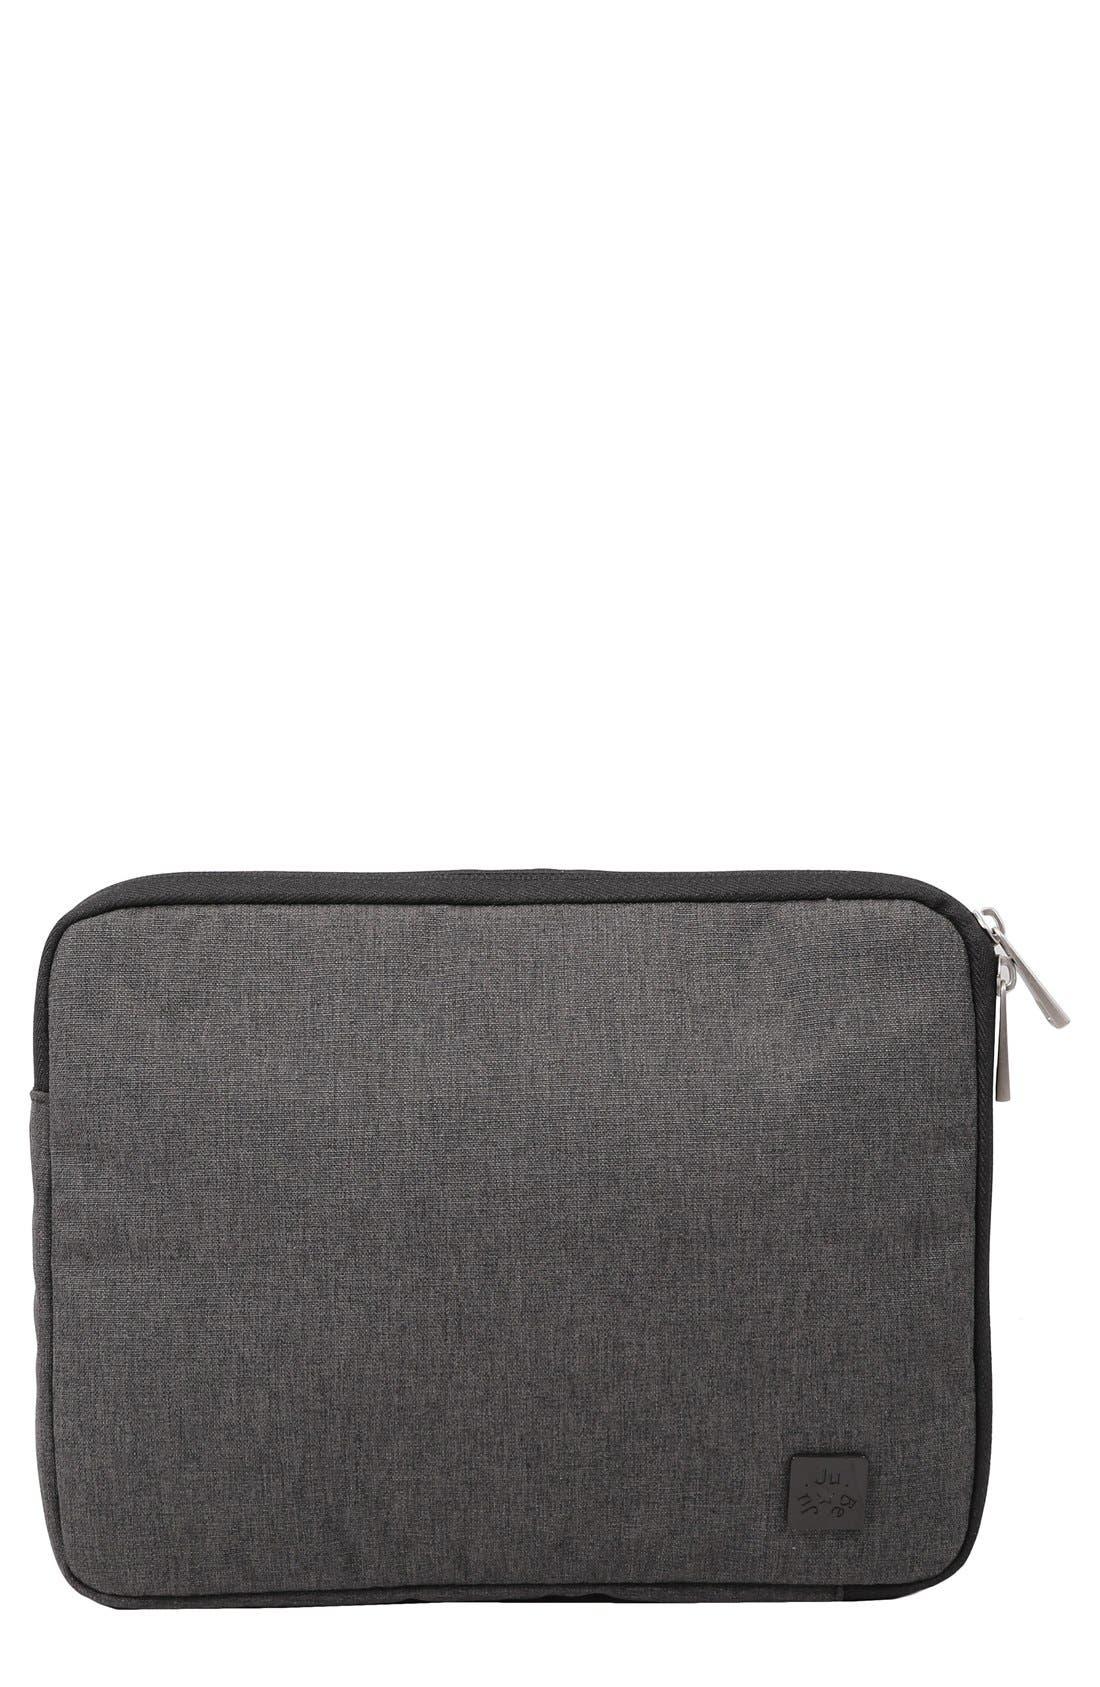 Micro Tech Tablet Case,                             Main thumbnail 1, color,                             Chrome